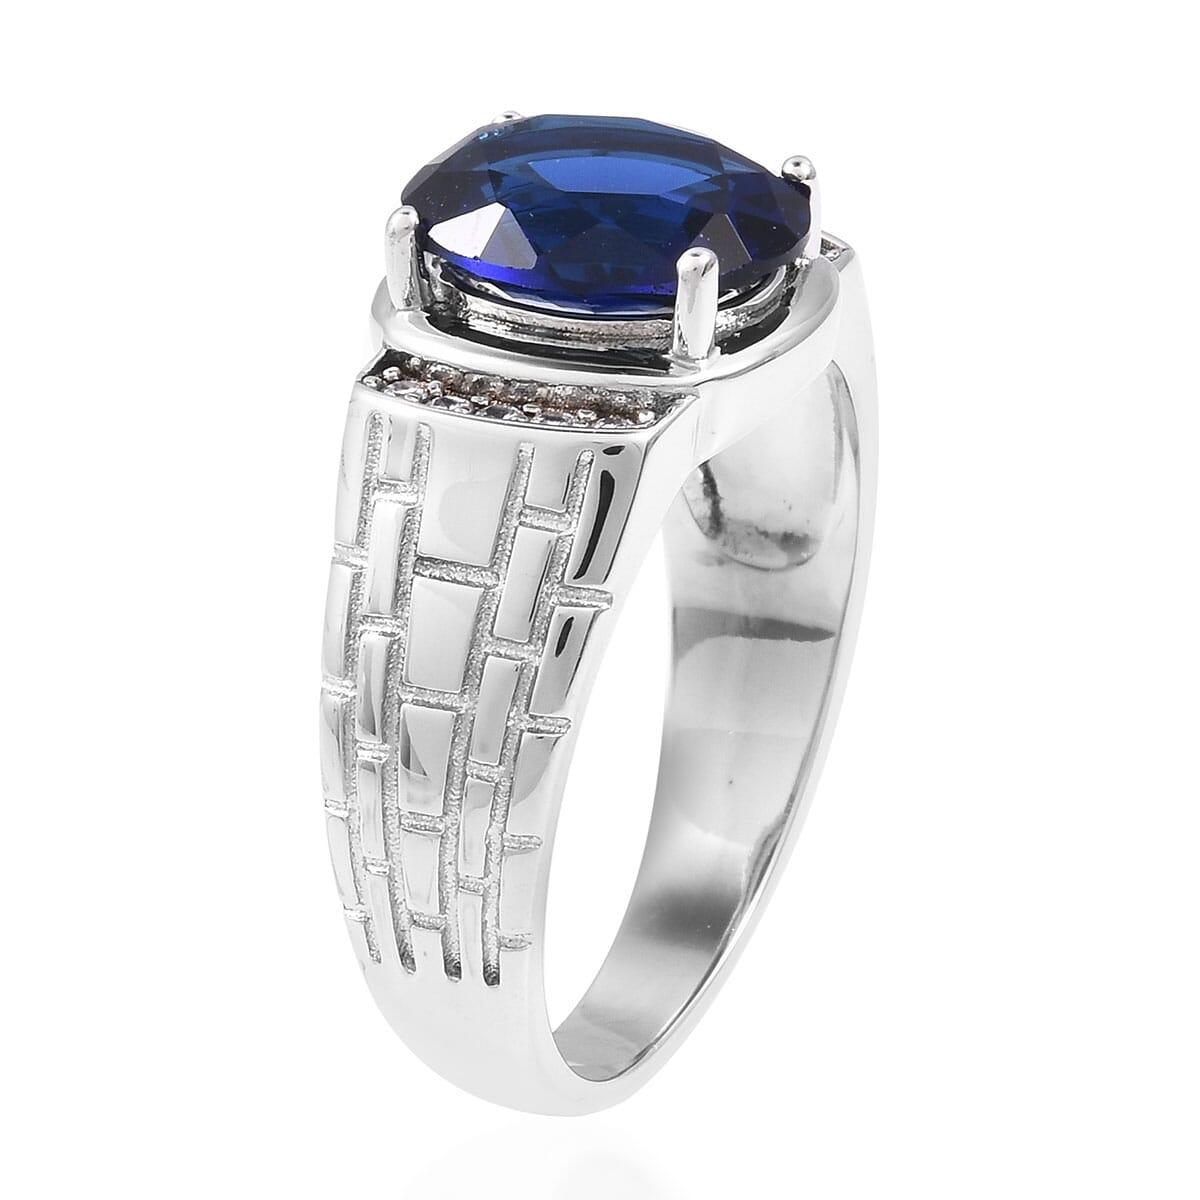 Blue Glass, White CZ Men's Ring in Silvertone (Size 12.0) 6.04 ctw